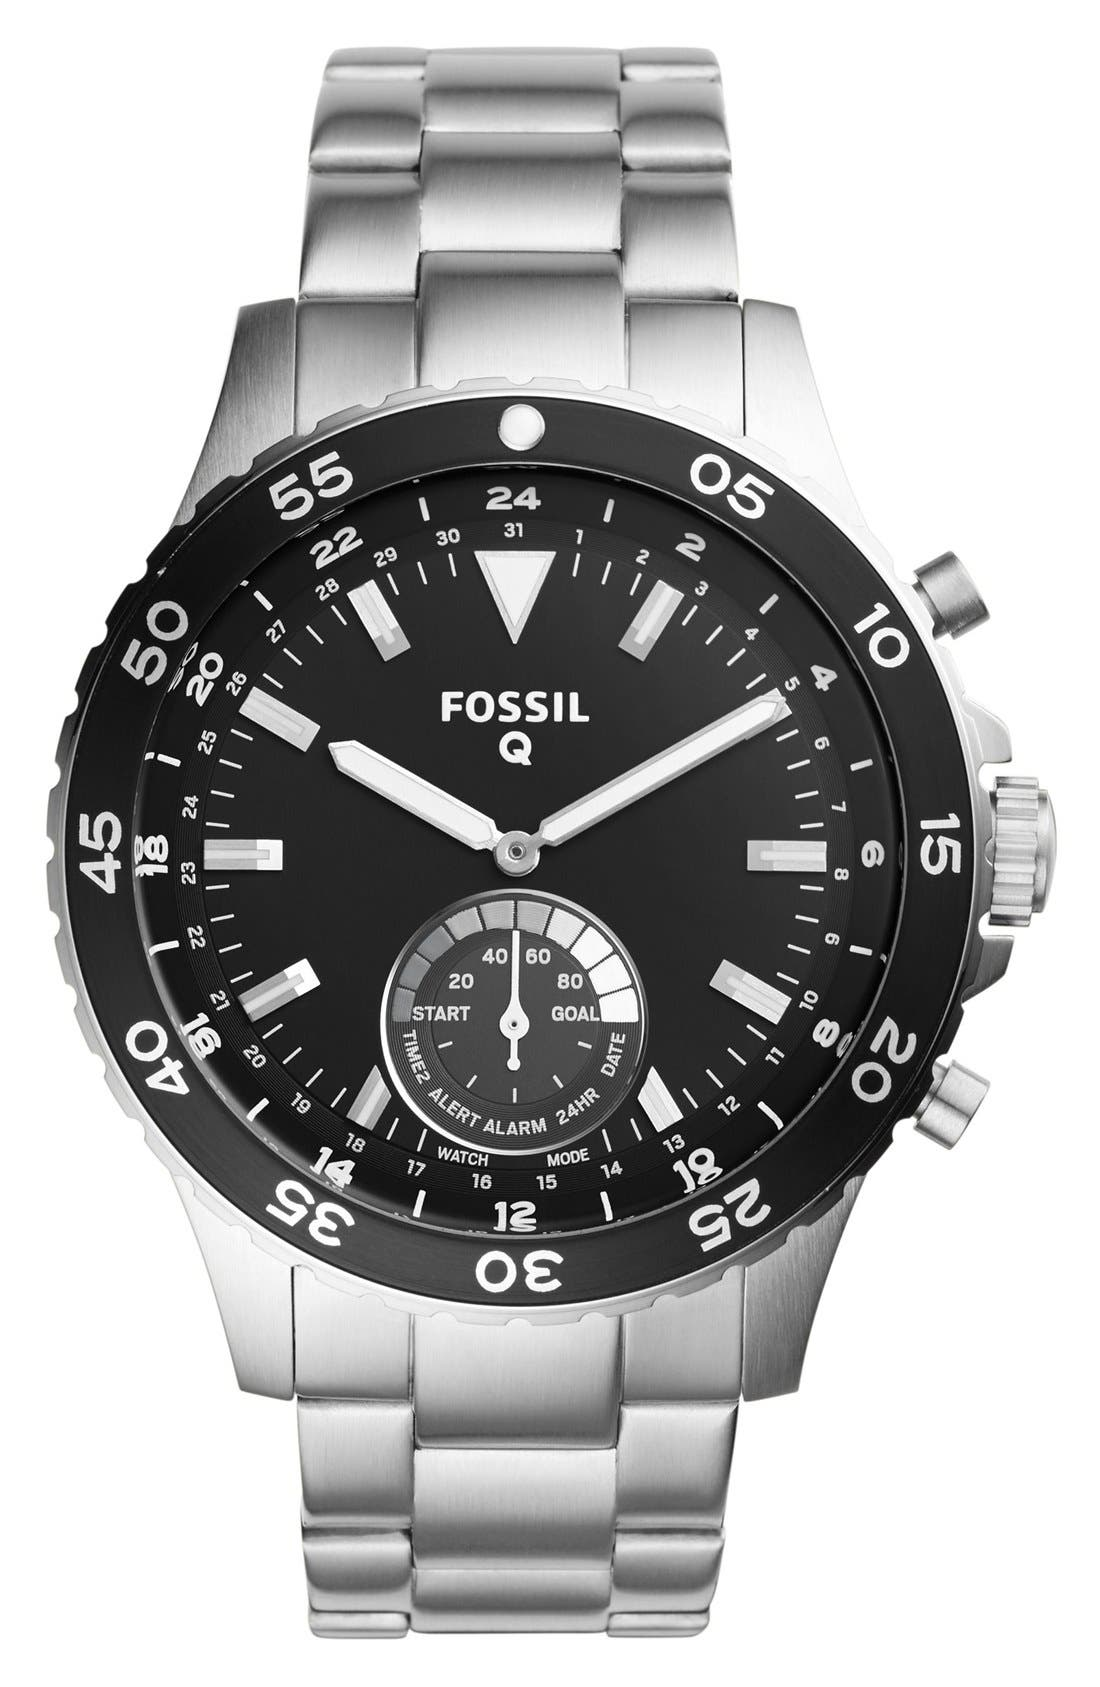 Fossil Q Crewmaster Smart Bracelet Watch, 46mm